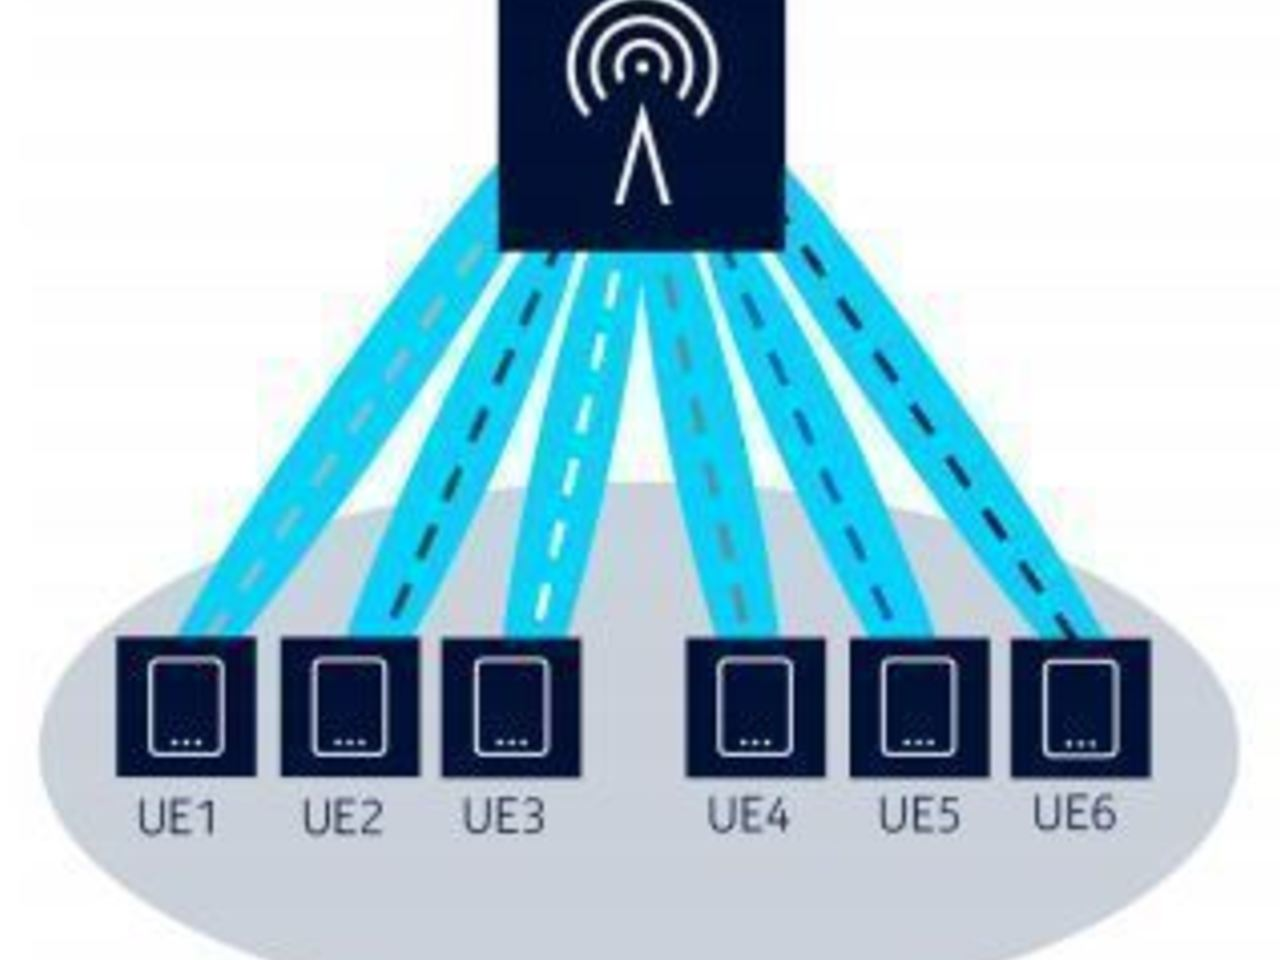 WirelessAI: Adaptive Beamforming for 5G